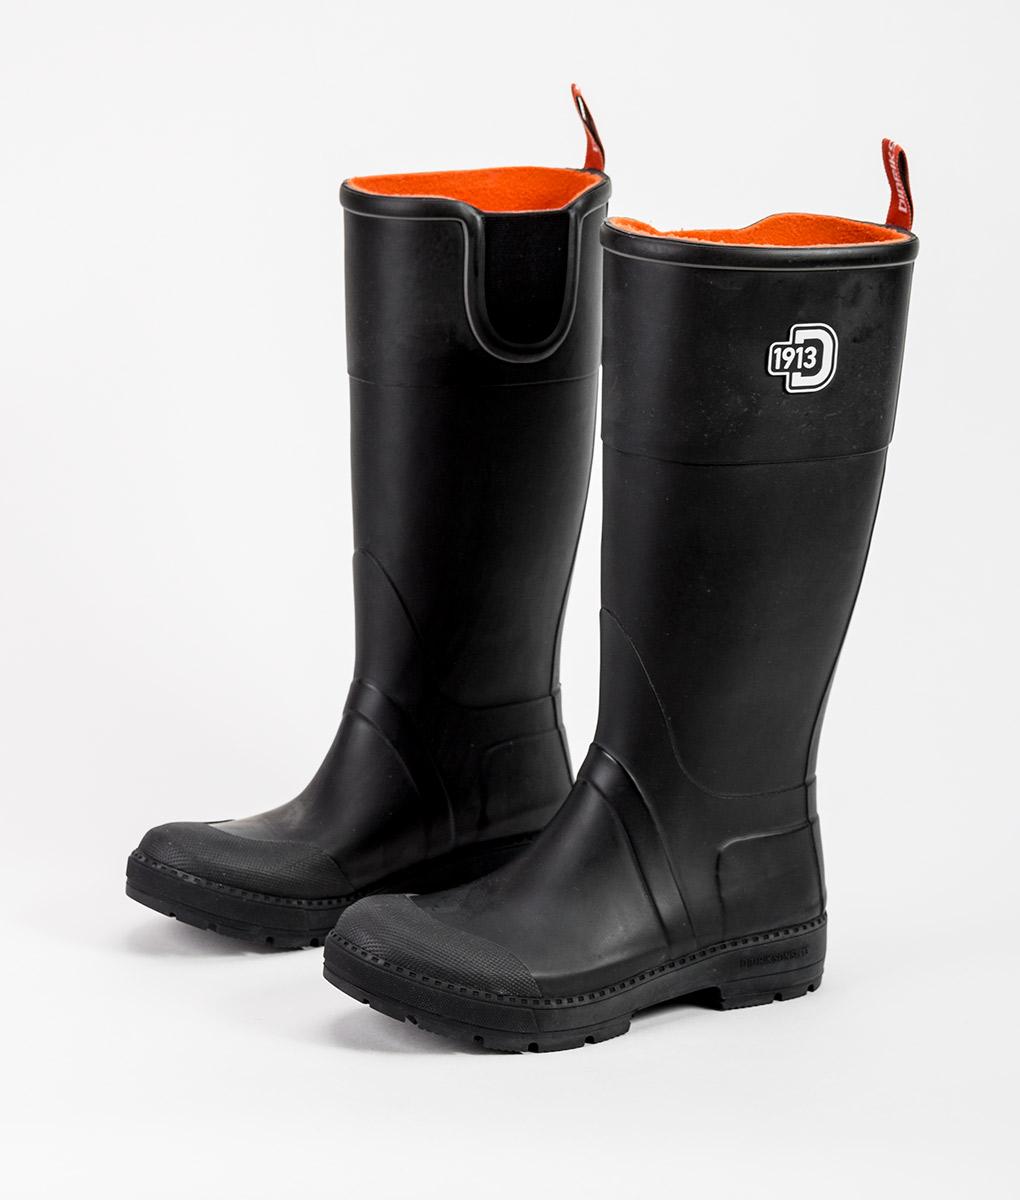 DIDRIKSONS Women Rain Boots KOSTER, Black 109.99